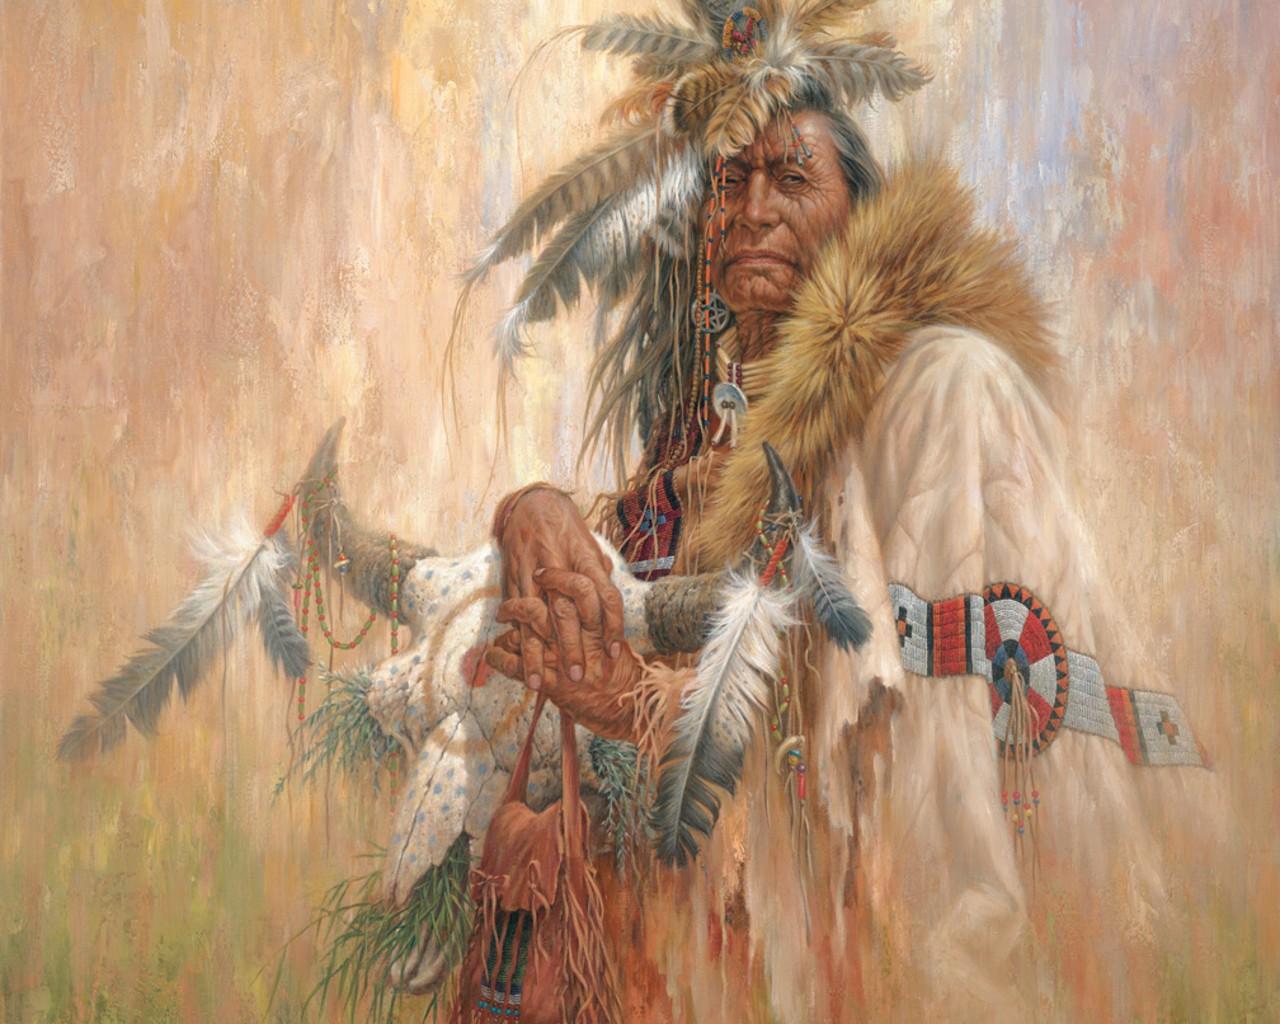 native american Wallpaper Background 13772 1280x1024